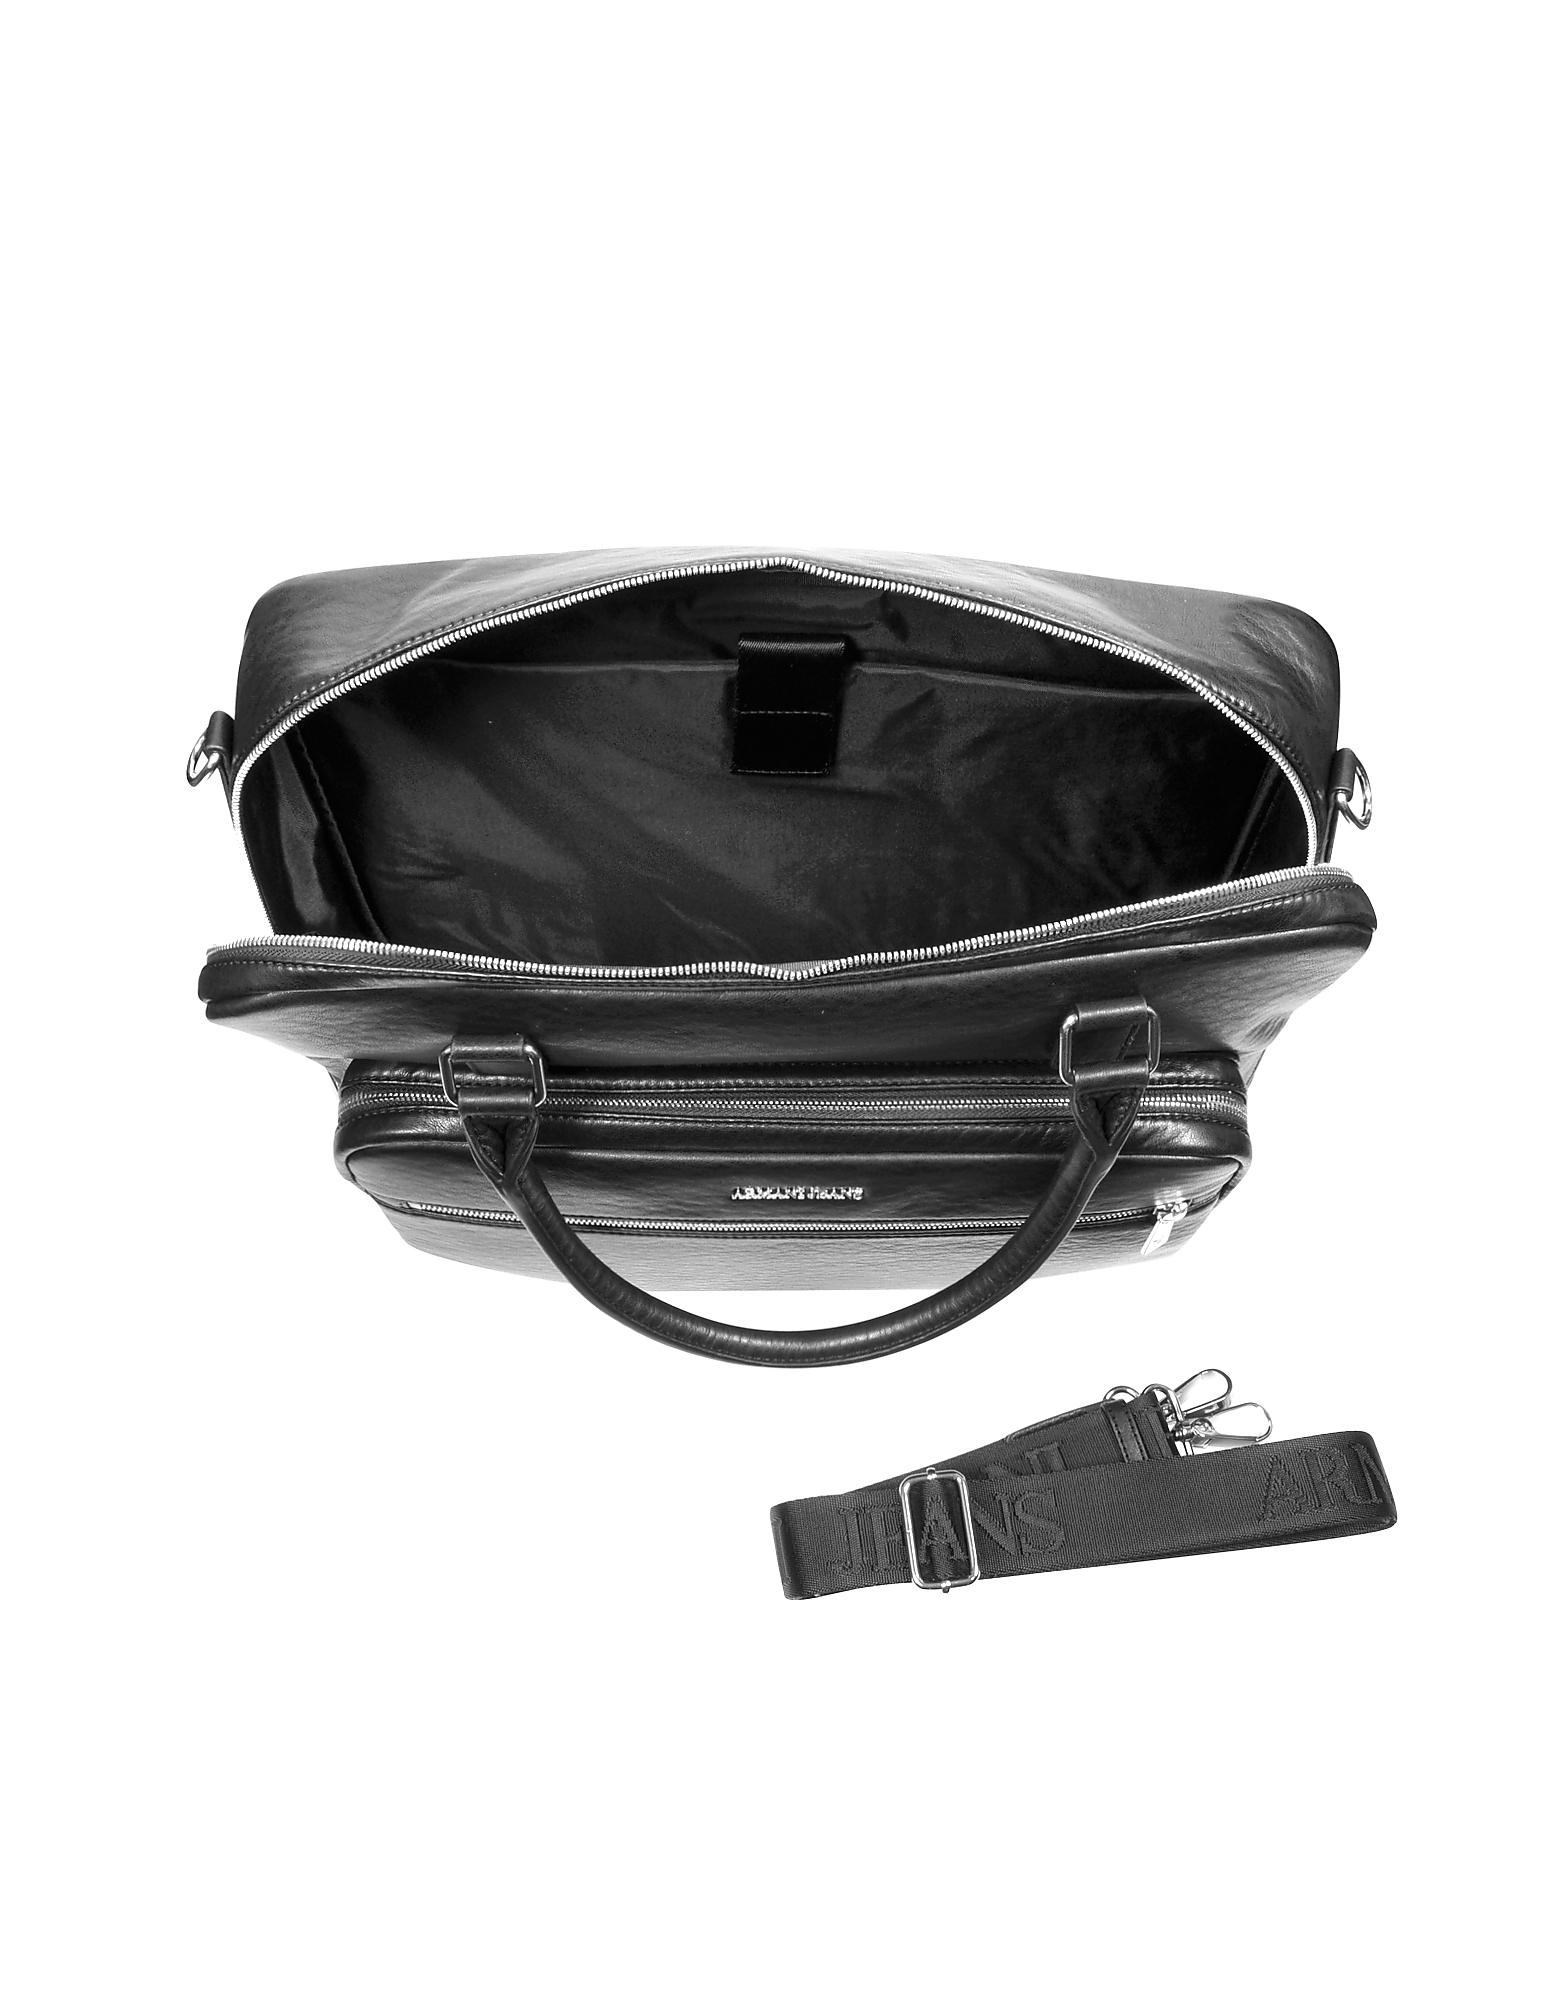 Armani Jeans Black Eco Leather Men S Briefcase In Black